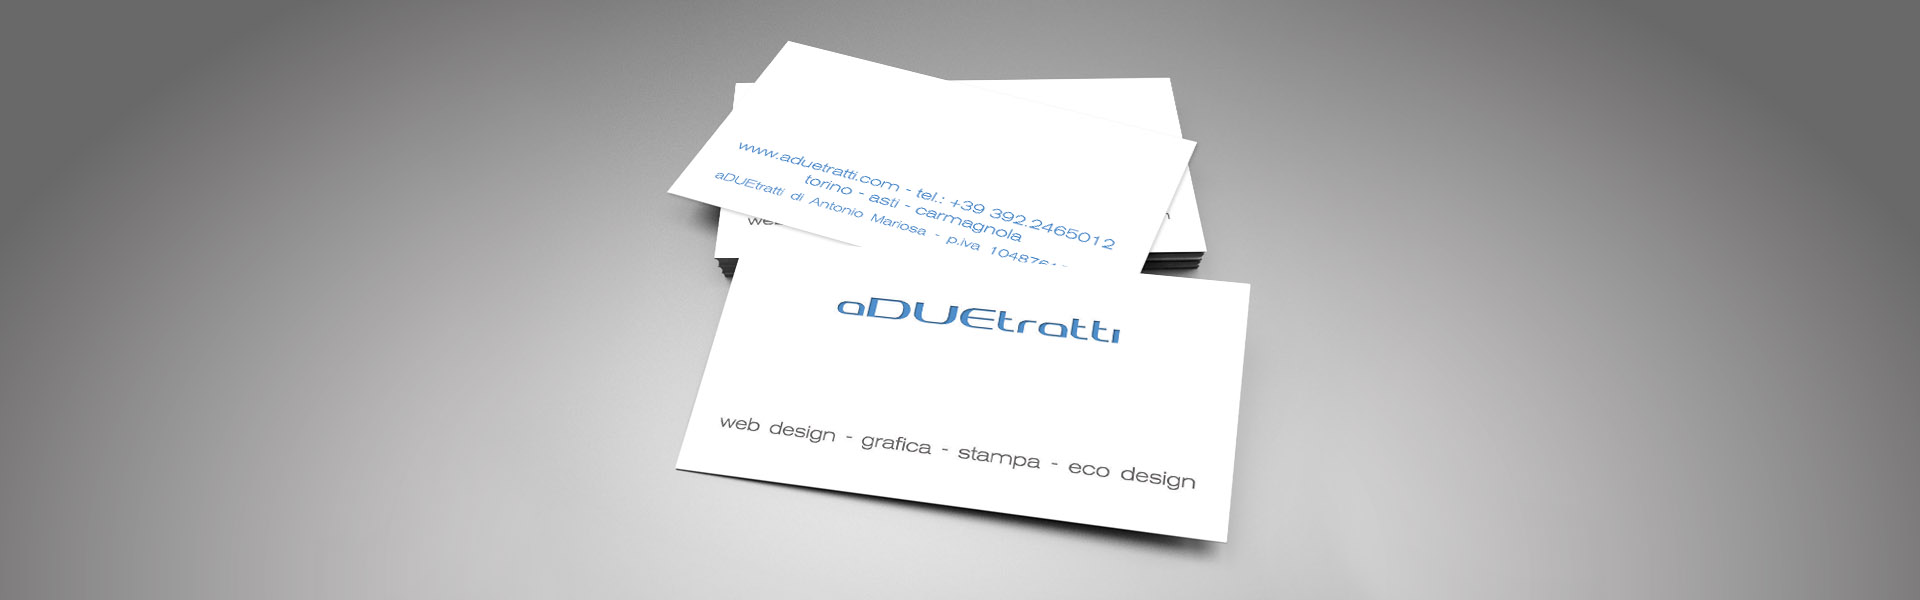 aduetratti-slider_biglietti